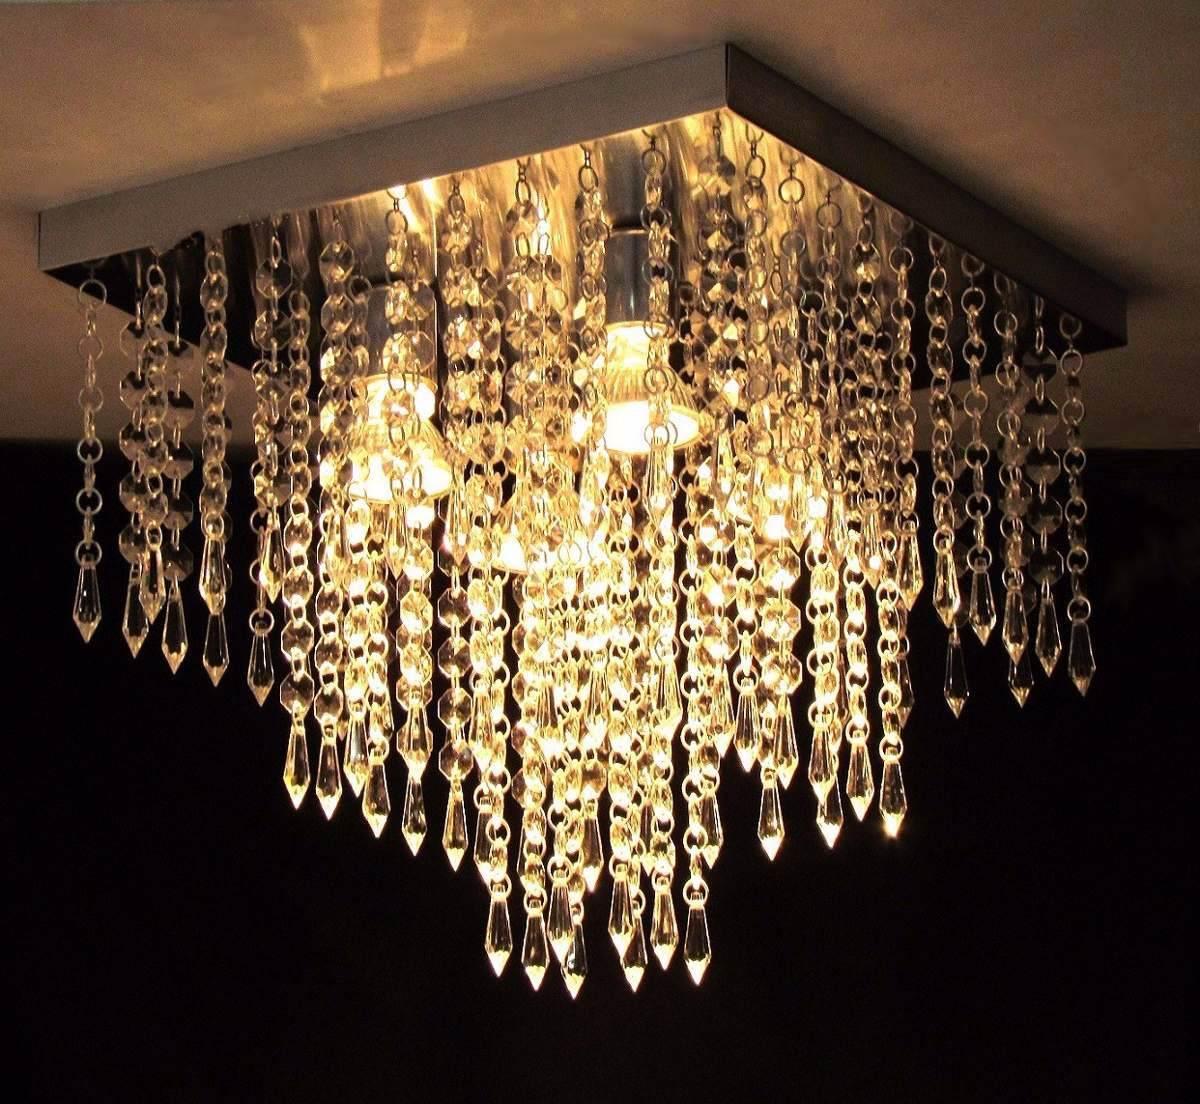 lustre de cristal egipcio asfour legitimo base inox 30x30 r 349 00 em mercado livre. Black Bedroom Furniture Sets. Home Design Ideas